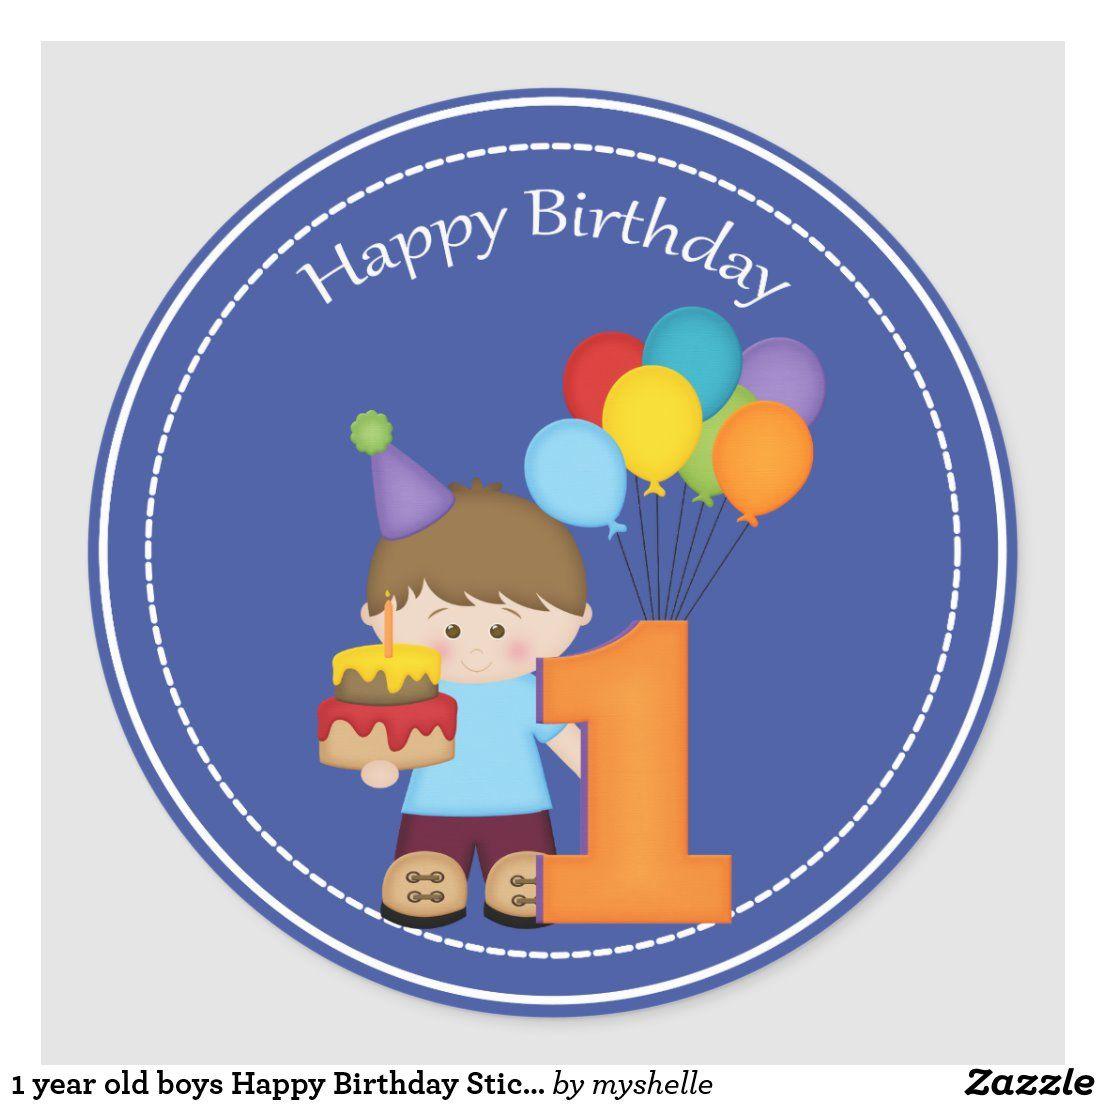 1 year old boys Happy Birthday Sticker in